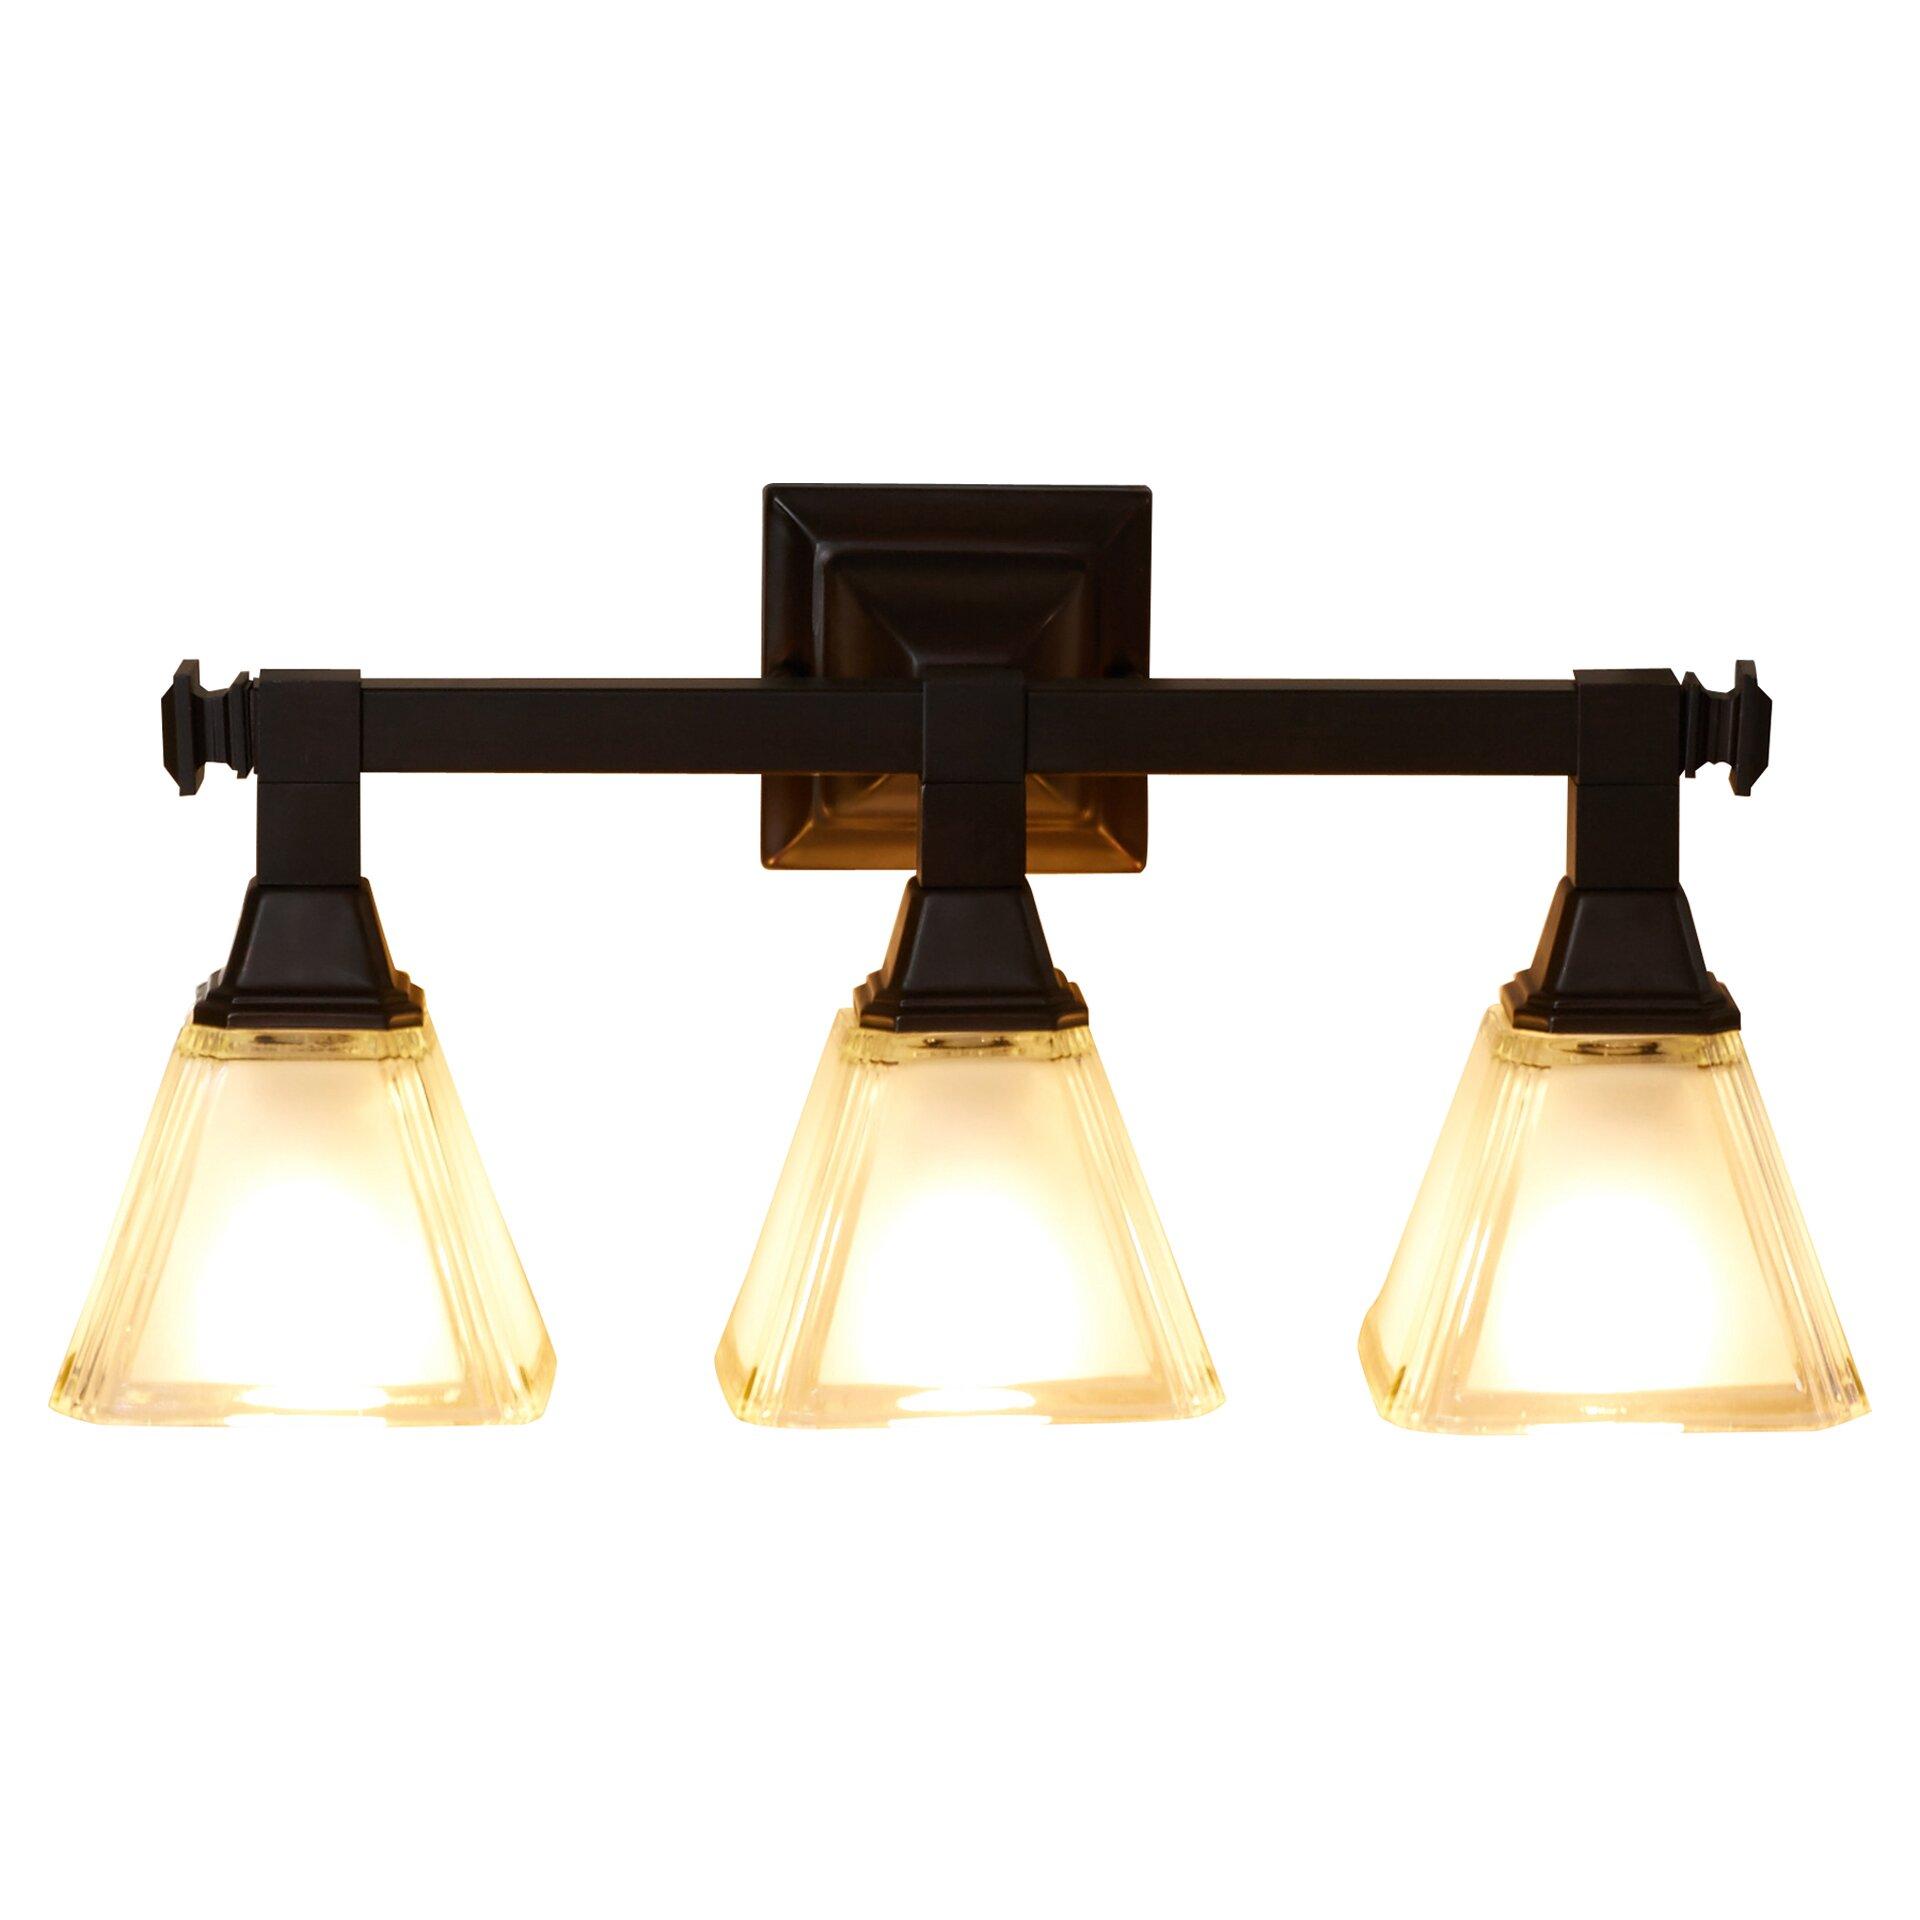 Charlton Home Gahagan 3 Light Vanity Light & Reviews Wayfair